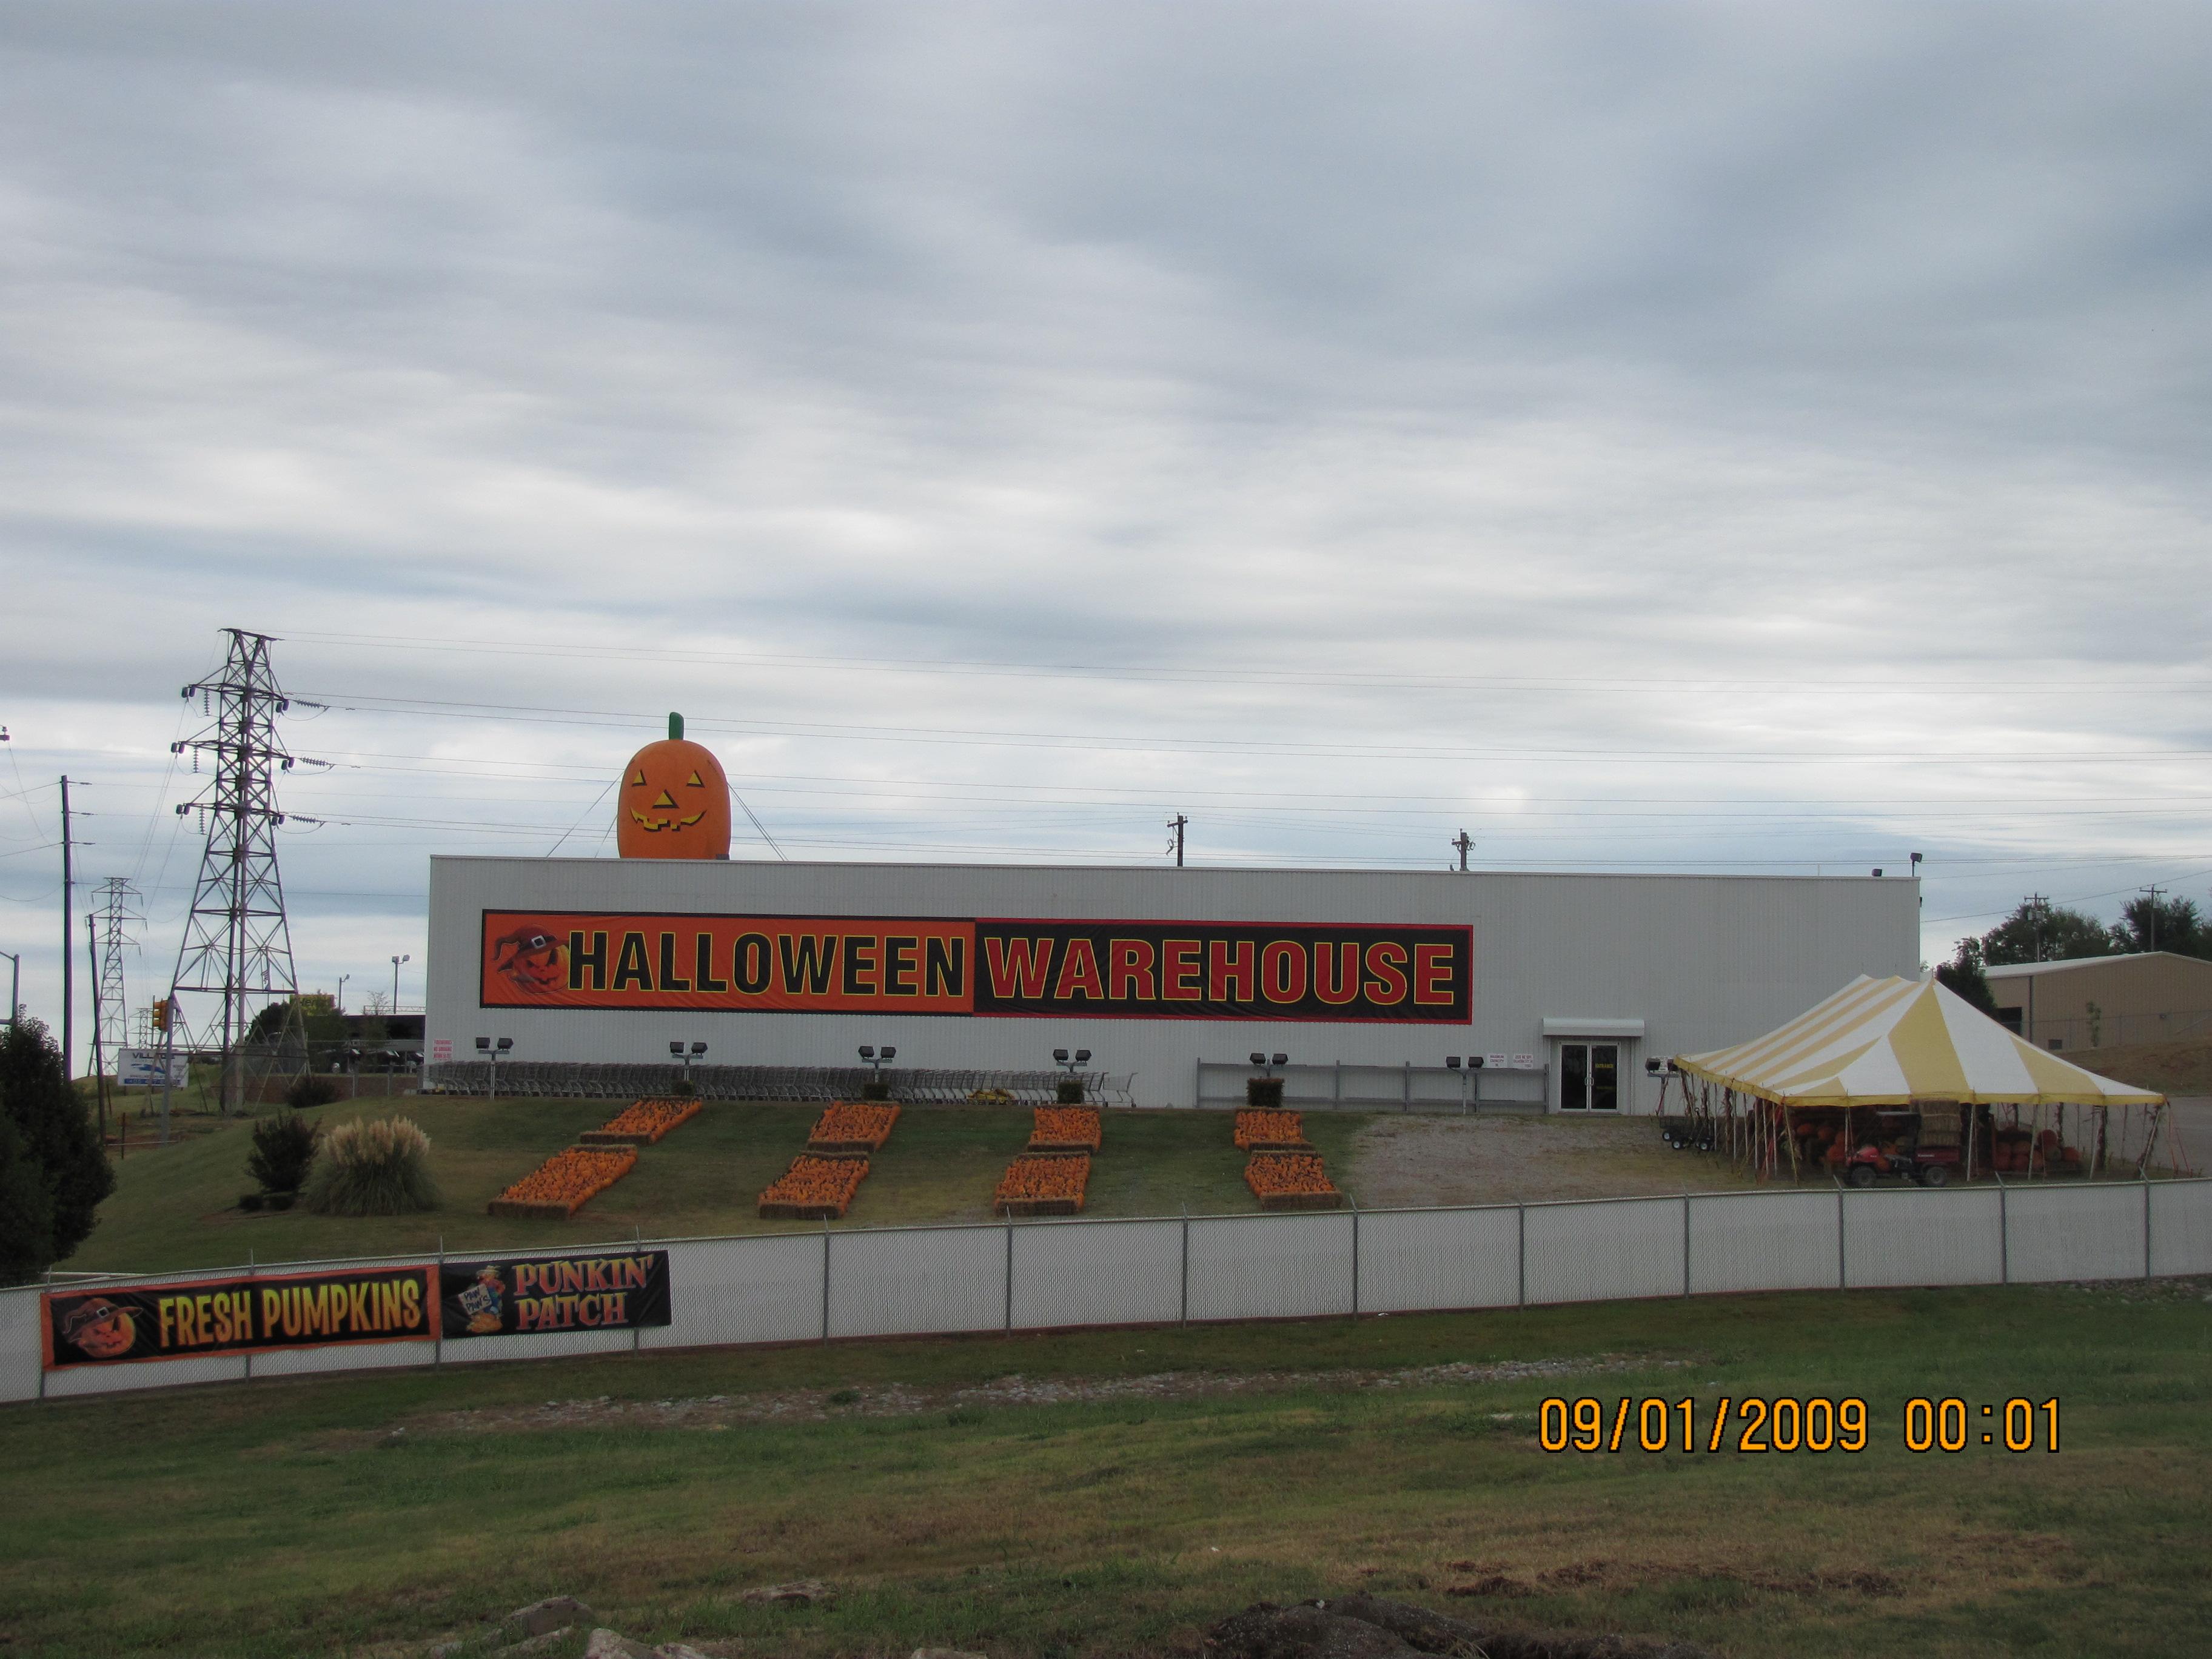 HALLOWEEN WAREHOUSE 2820 NE 50th St, Oklahoma City, OK 73121 - YP.com